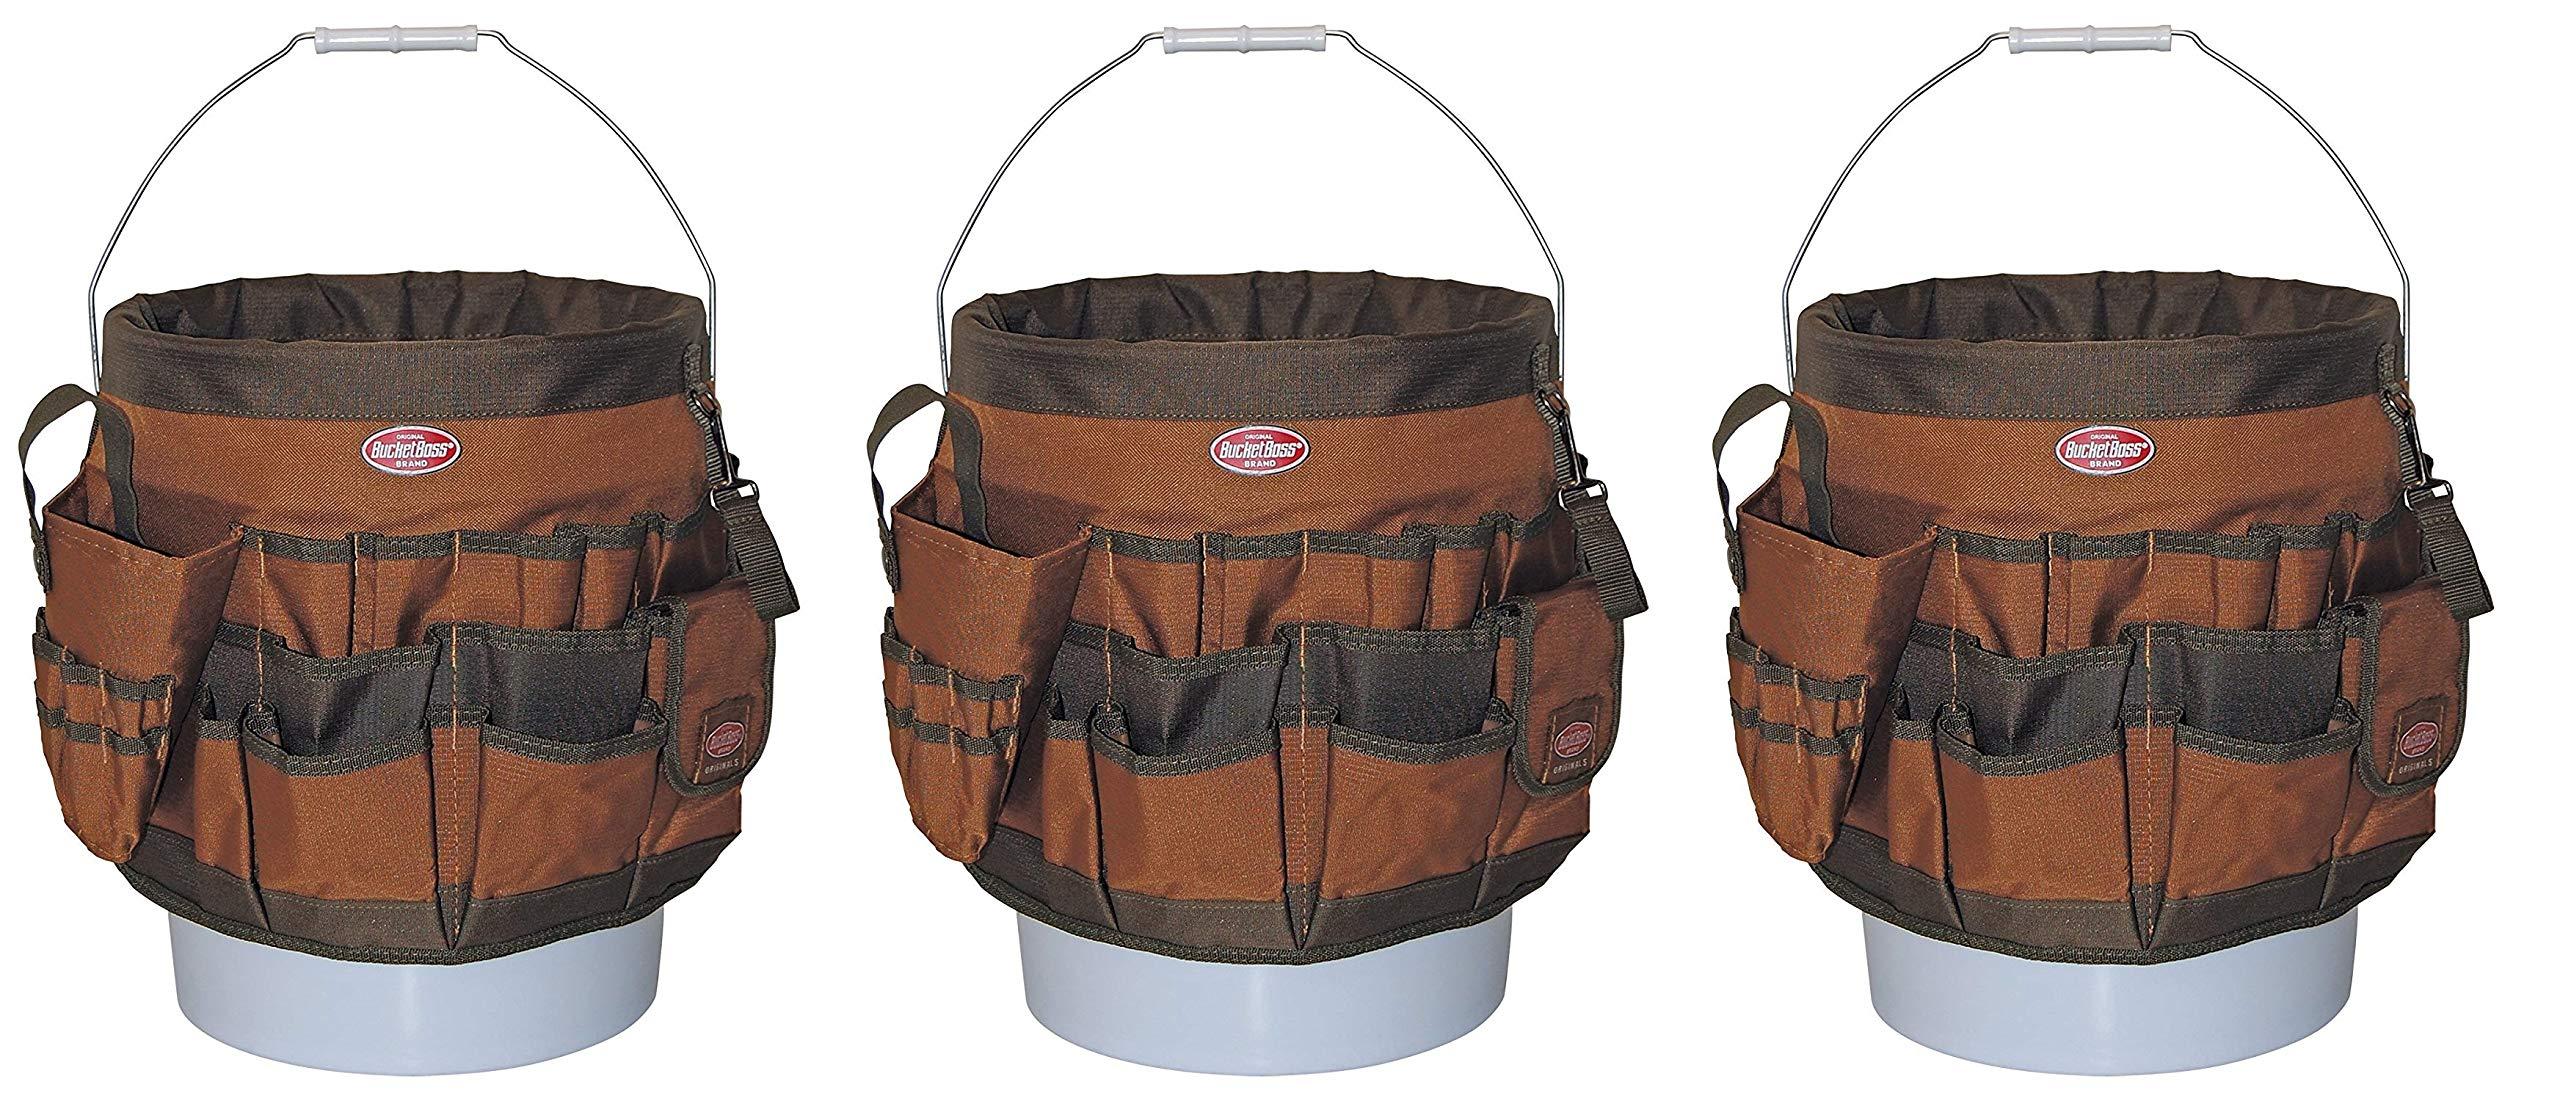 Bucket Boss 10056 Bucket Tool Organizer with 56 Pocket (Pack of 3)